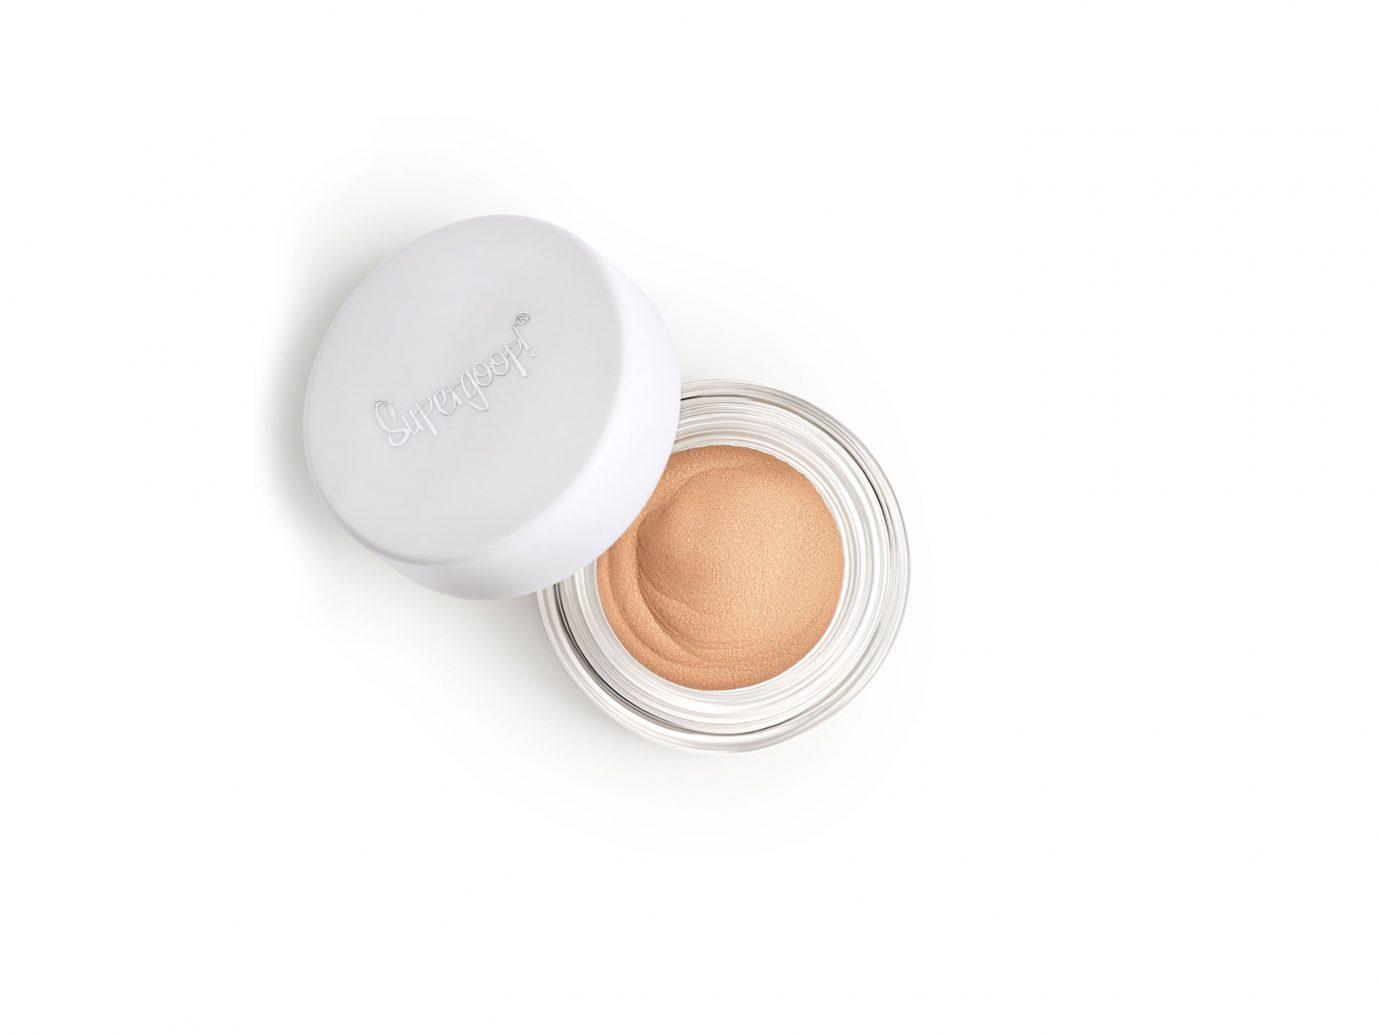 Supergoop! Shimmershade Illuminating Cream Eyeshadow